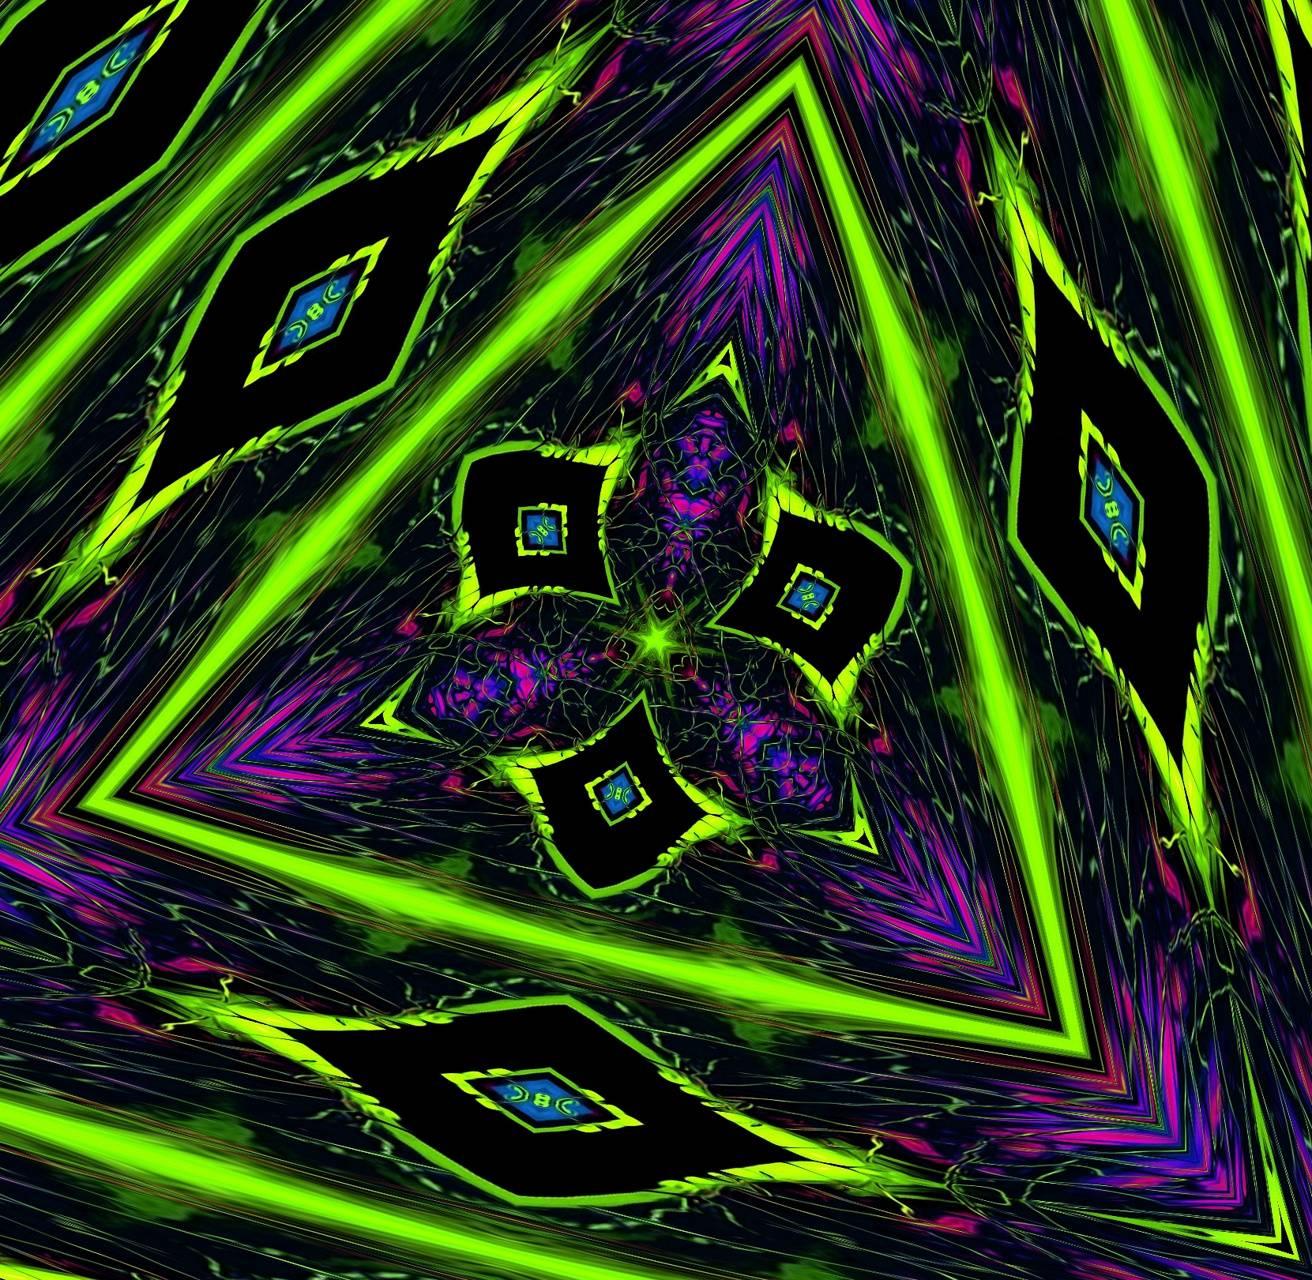 Digital triangle art